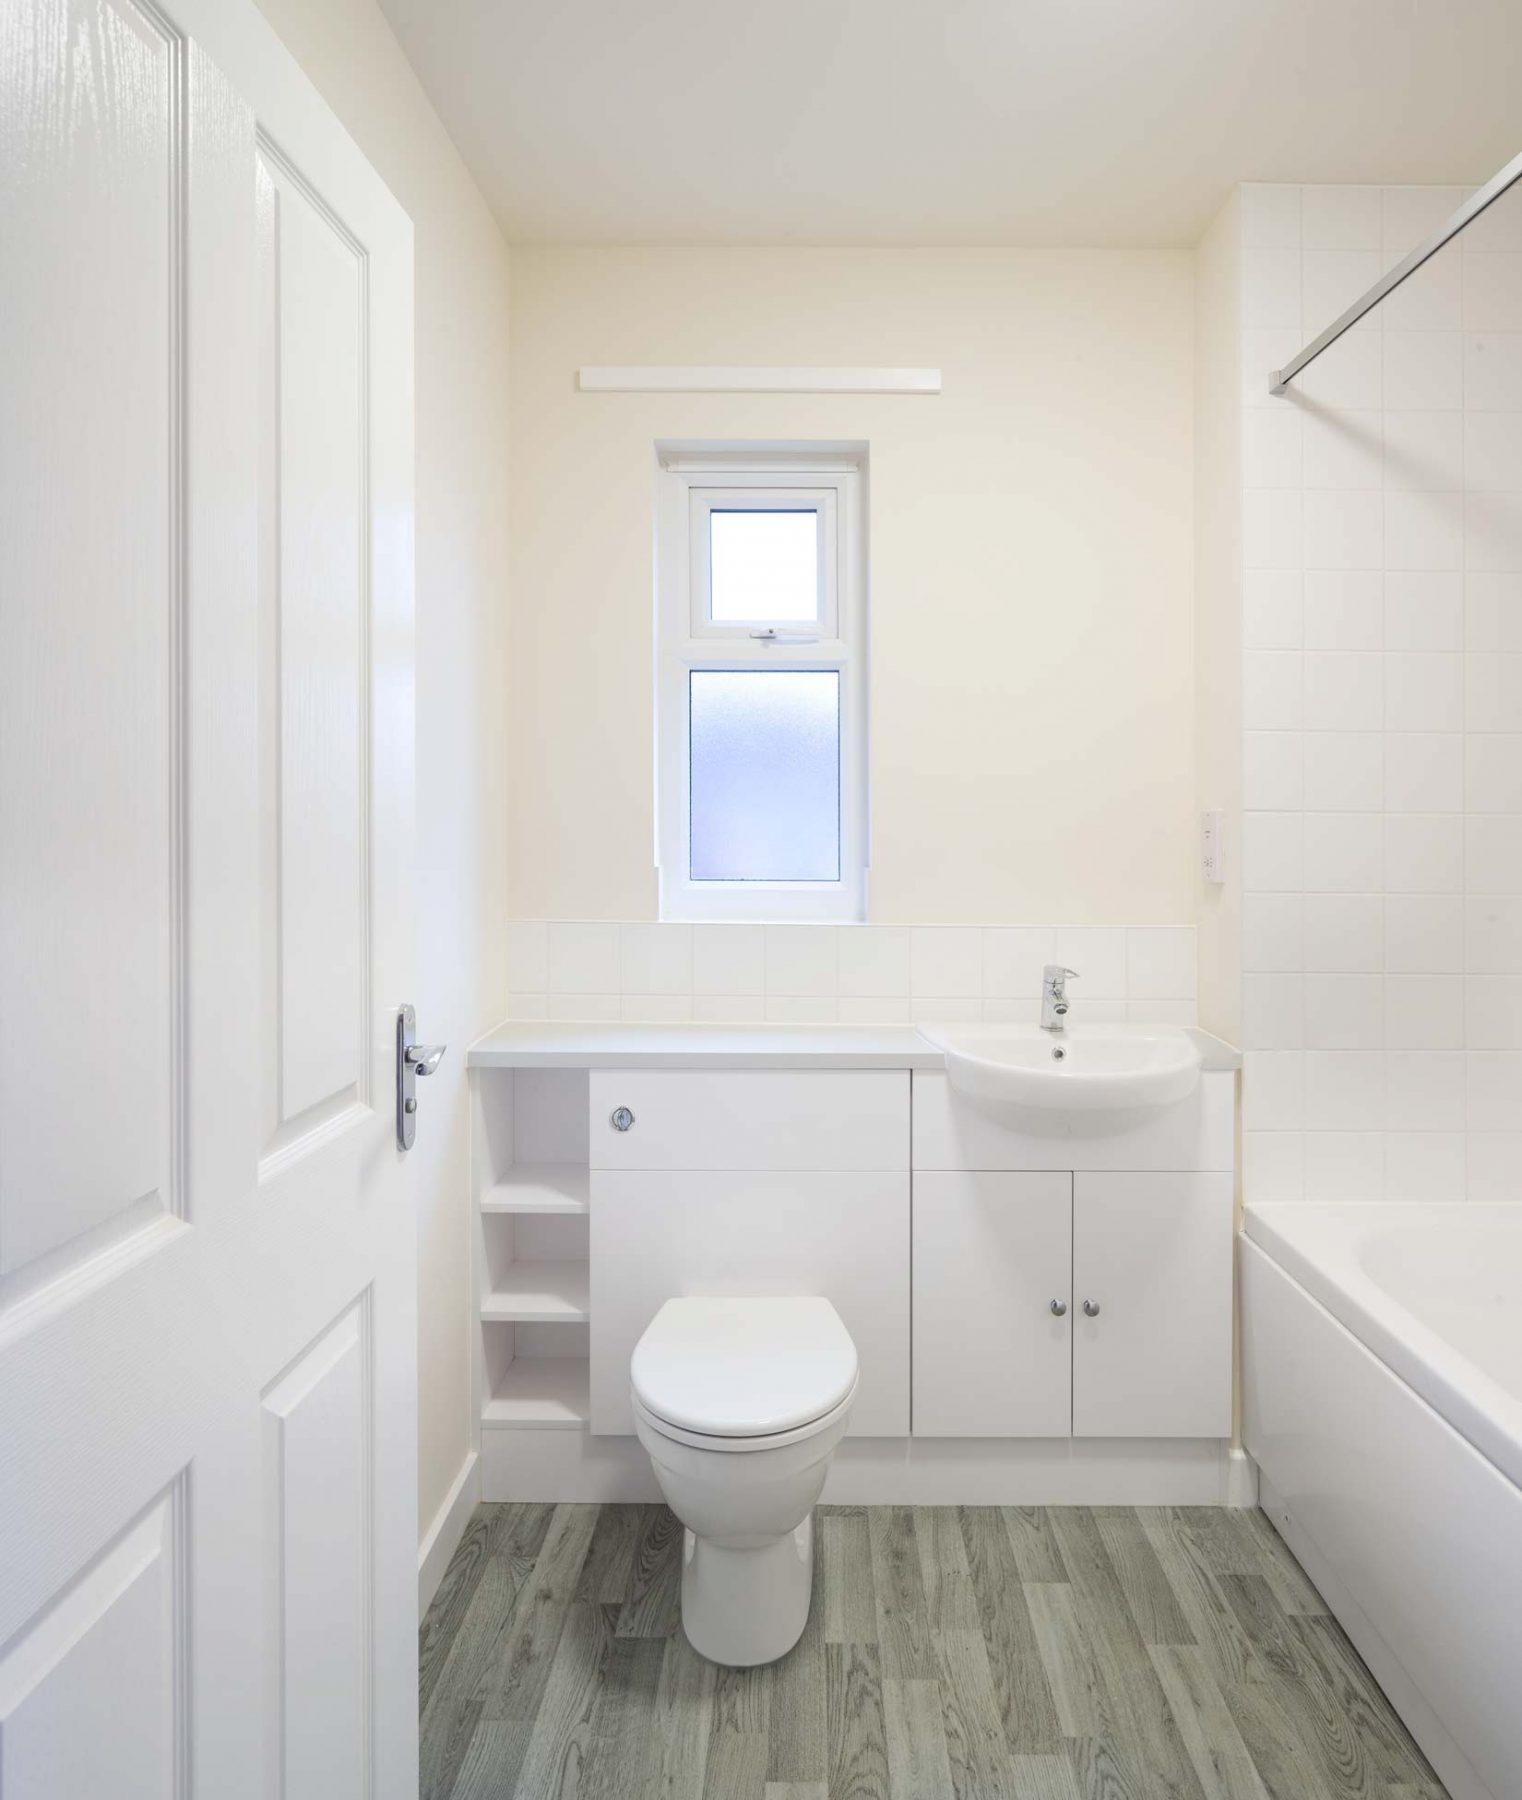 toilet-interior-new-housing-development-unfurnished